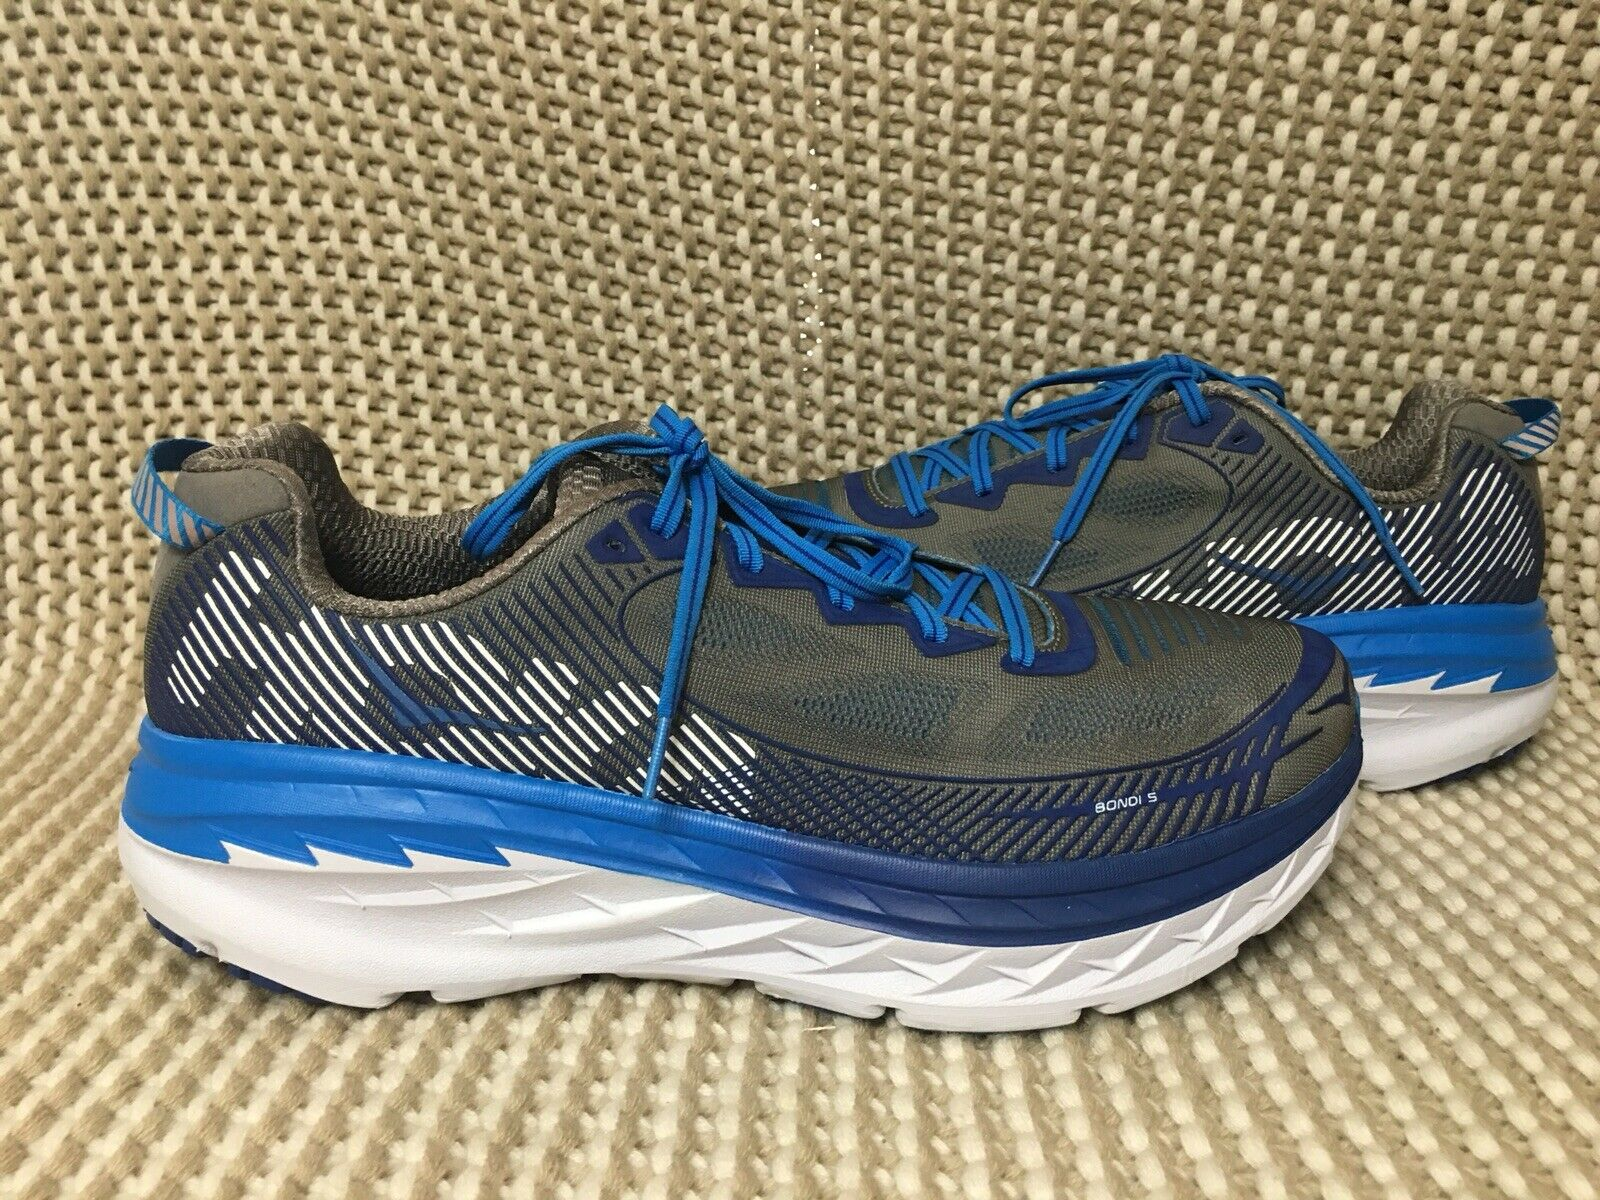 NEW Uomo HOKA ONE ONE BONDI 5 RUNNING scarpe US US US 12.5   EU 47 1 3 blu 55685d